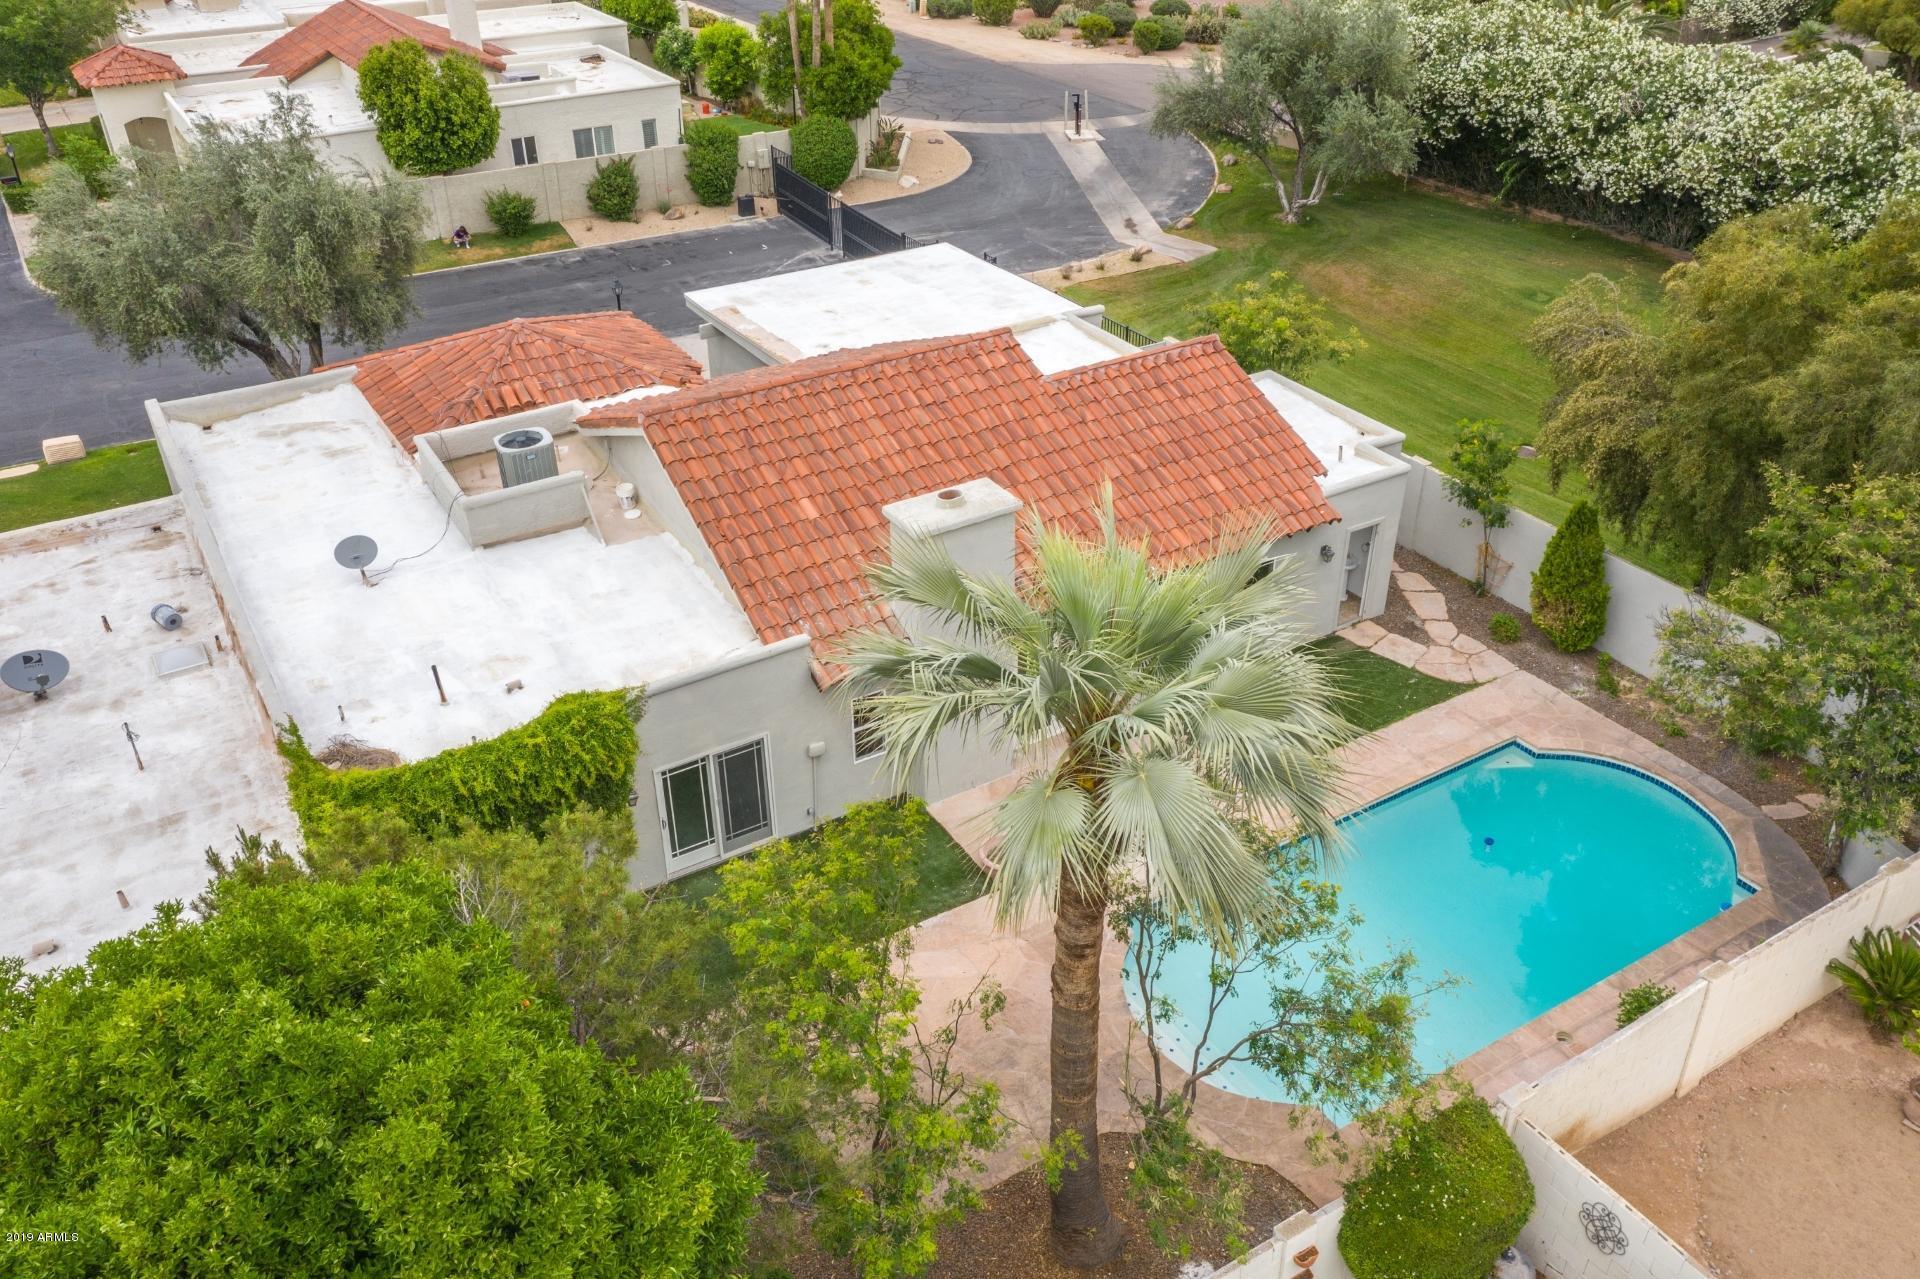 MLS 5921334 7355 E CLAREMONT Street, Scottsdale, AZ 85250 Scottsdale AZ Private Pool